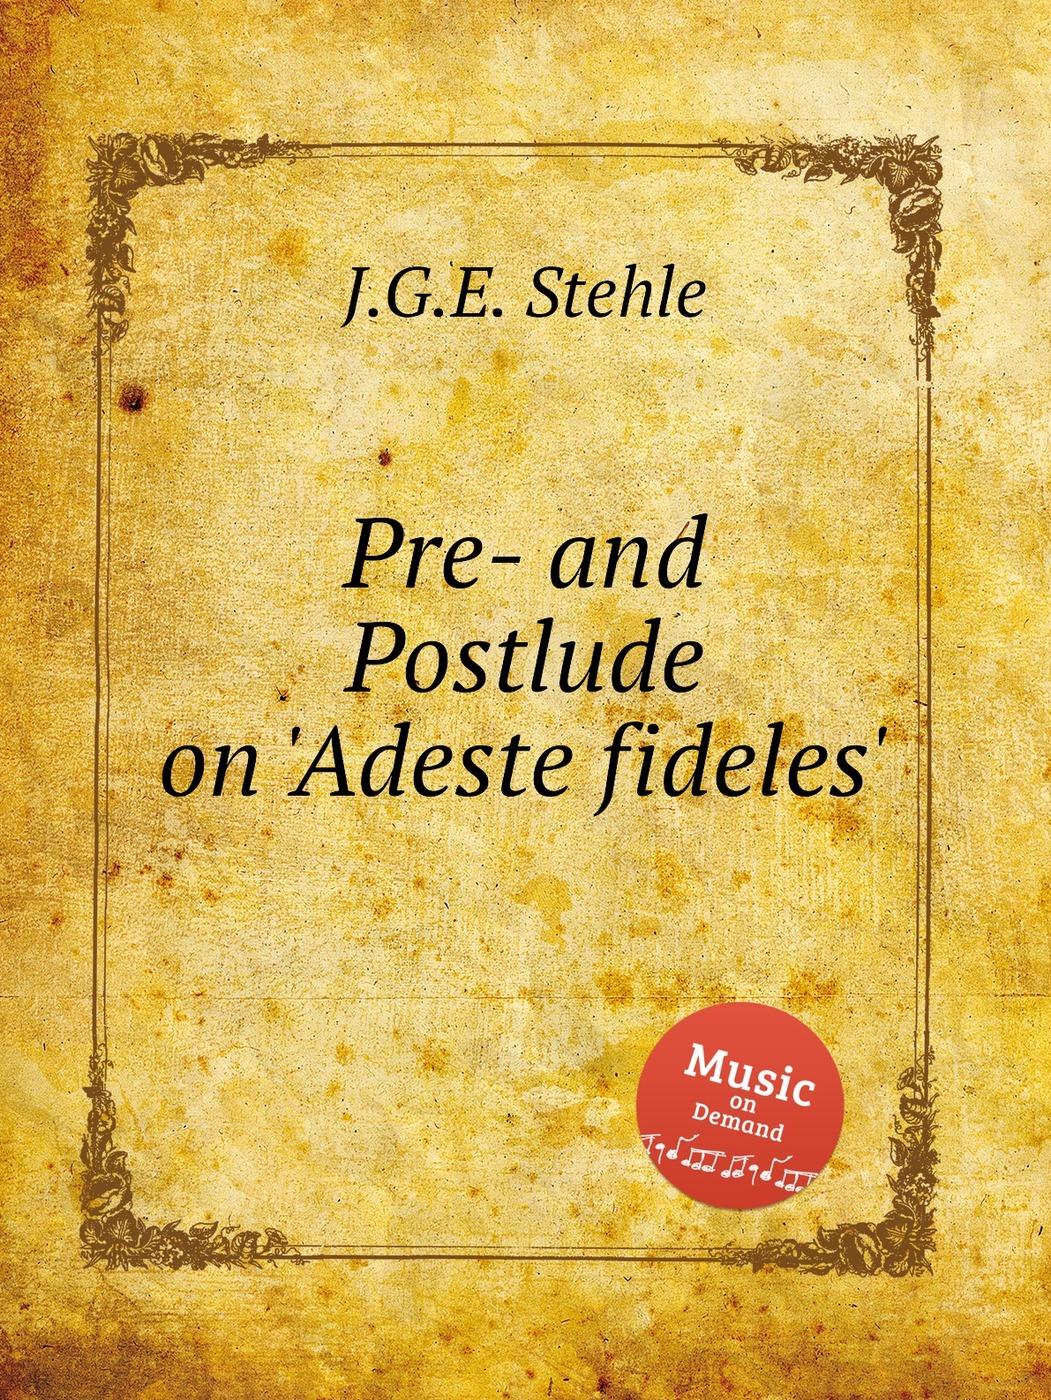 Pre- and Postlude on 'Adeste fideles'